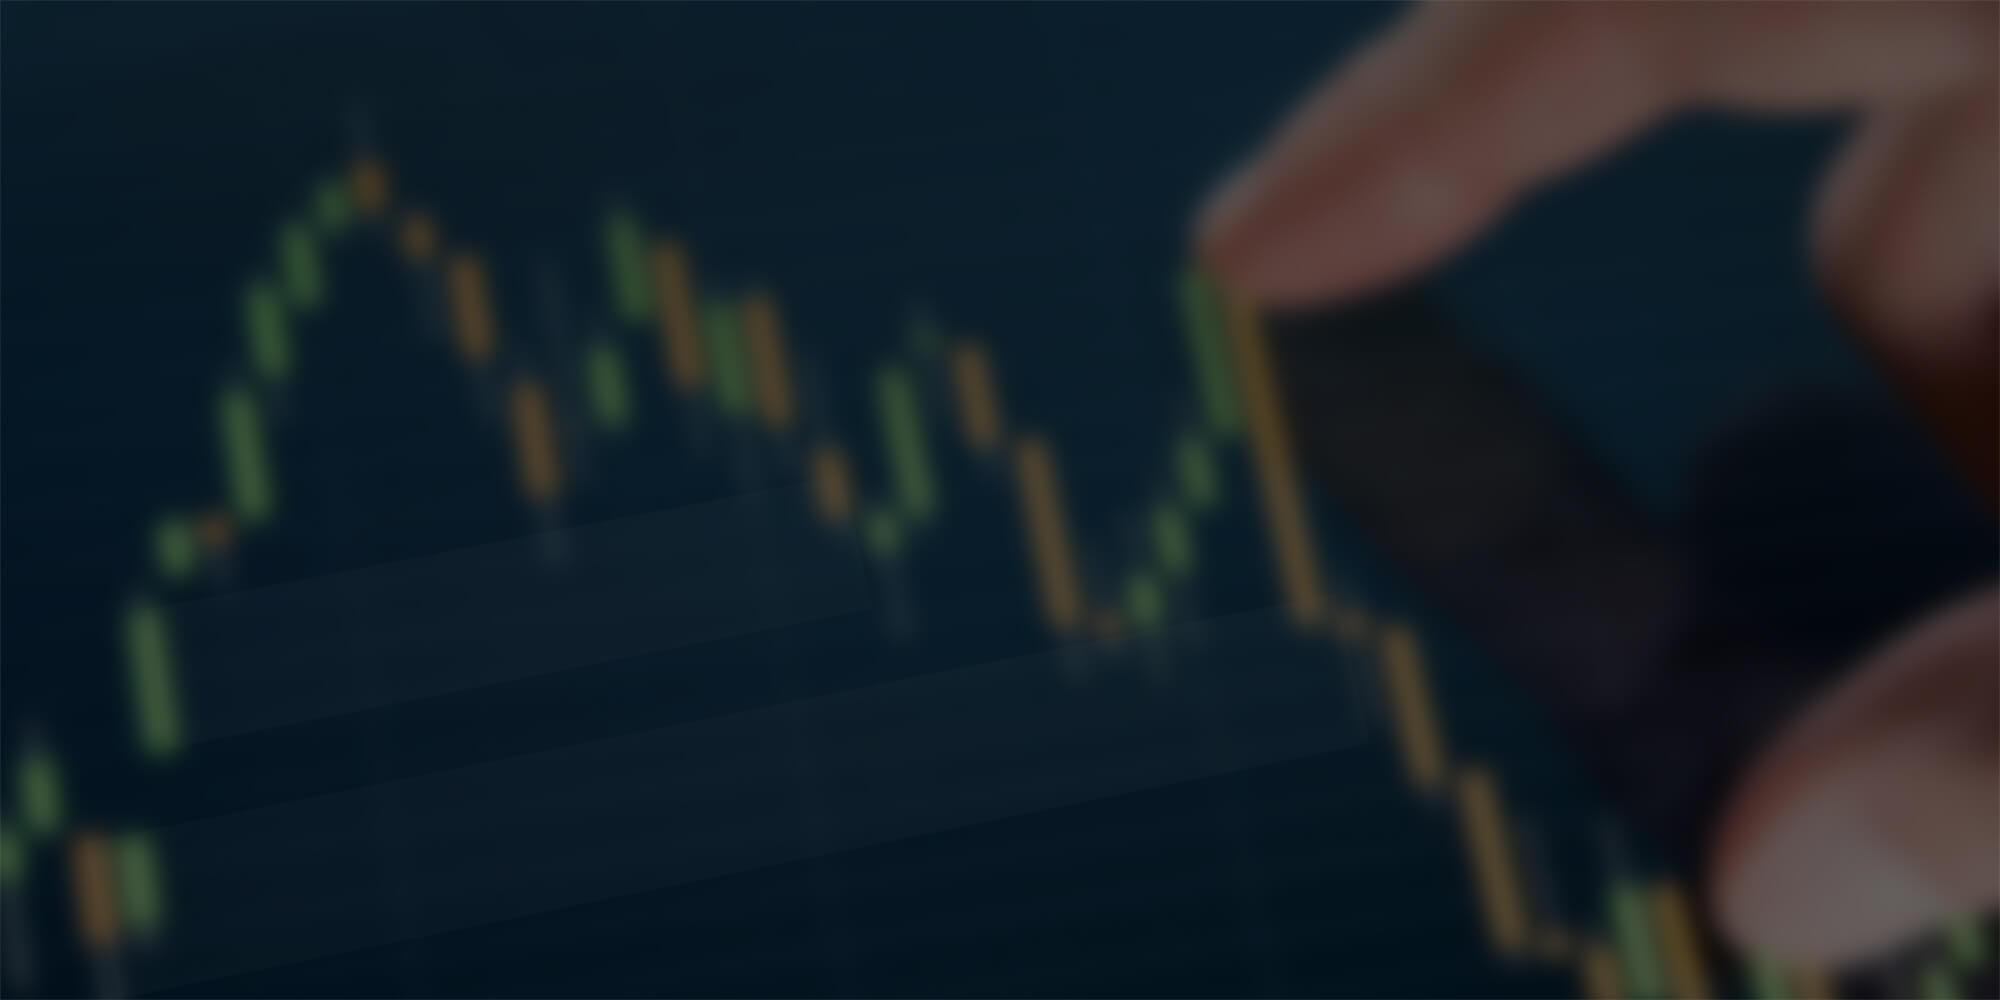 Futures market symbols list exchange traded biocorpaavc Choice Image